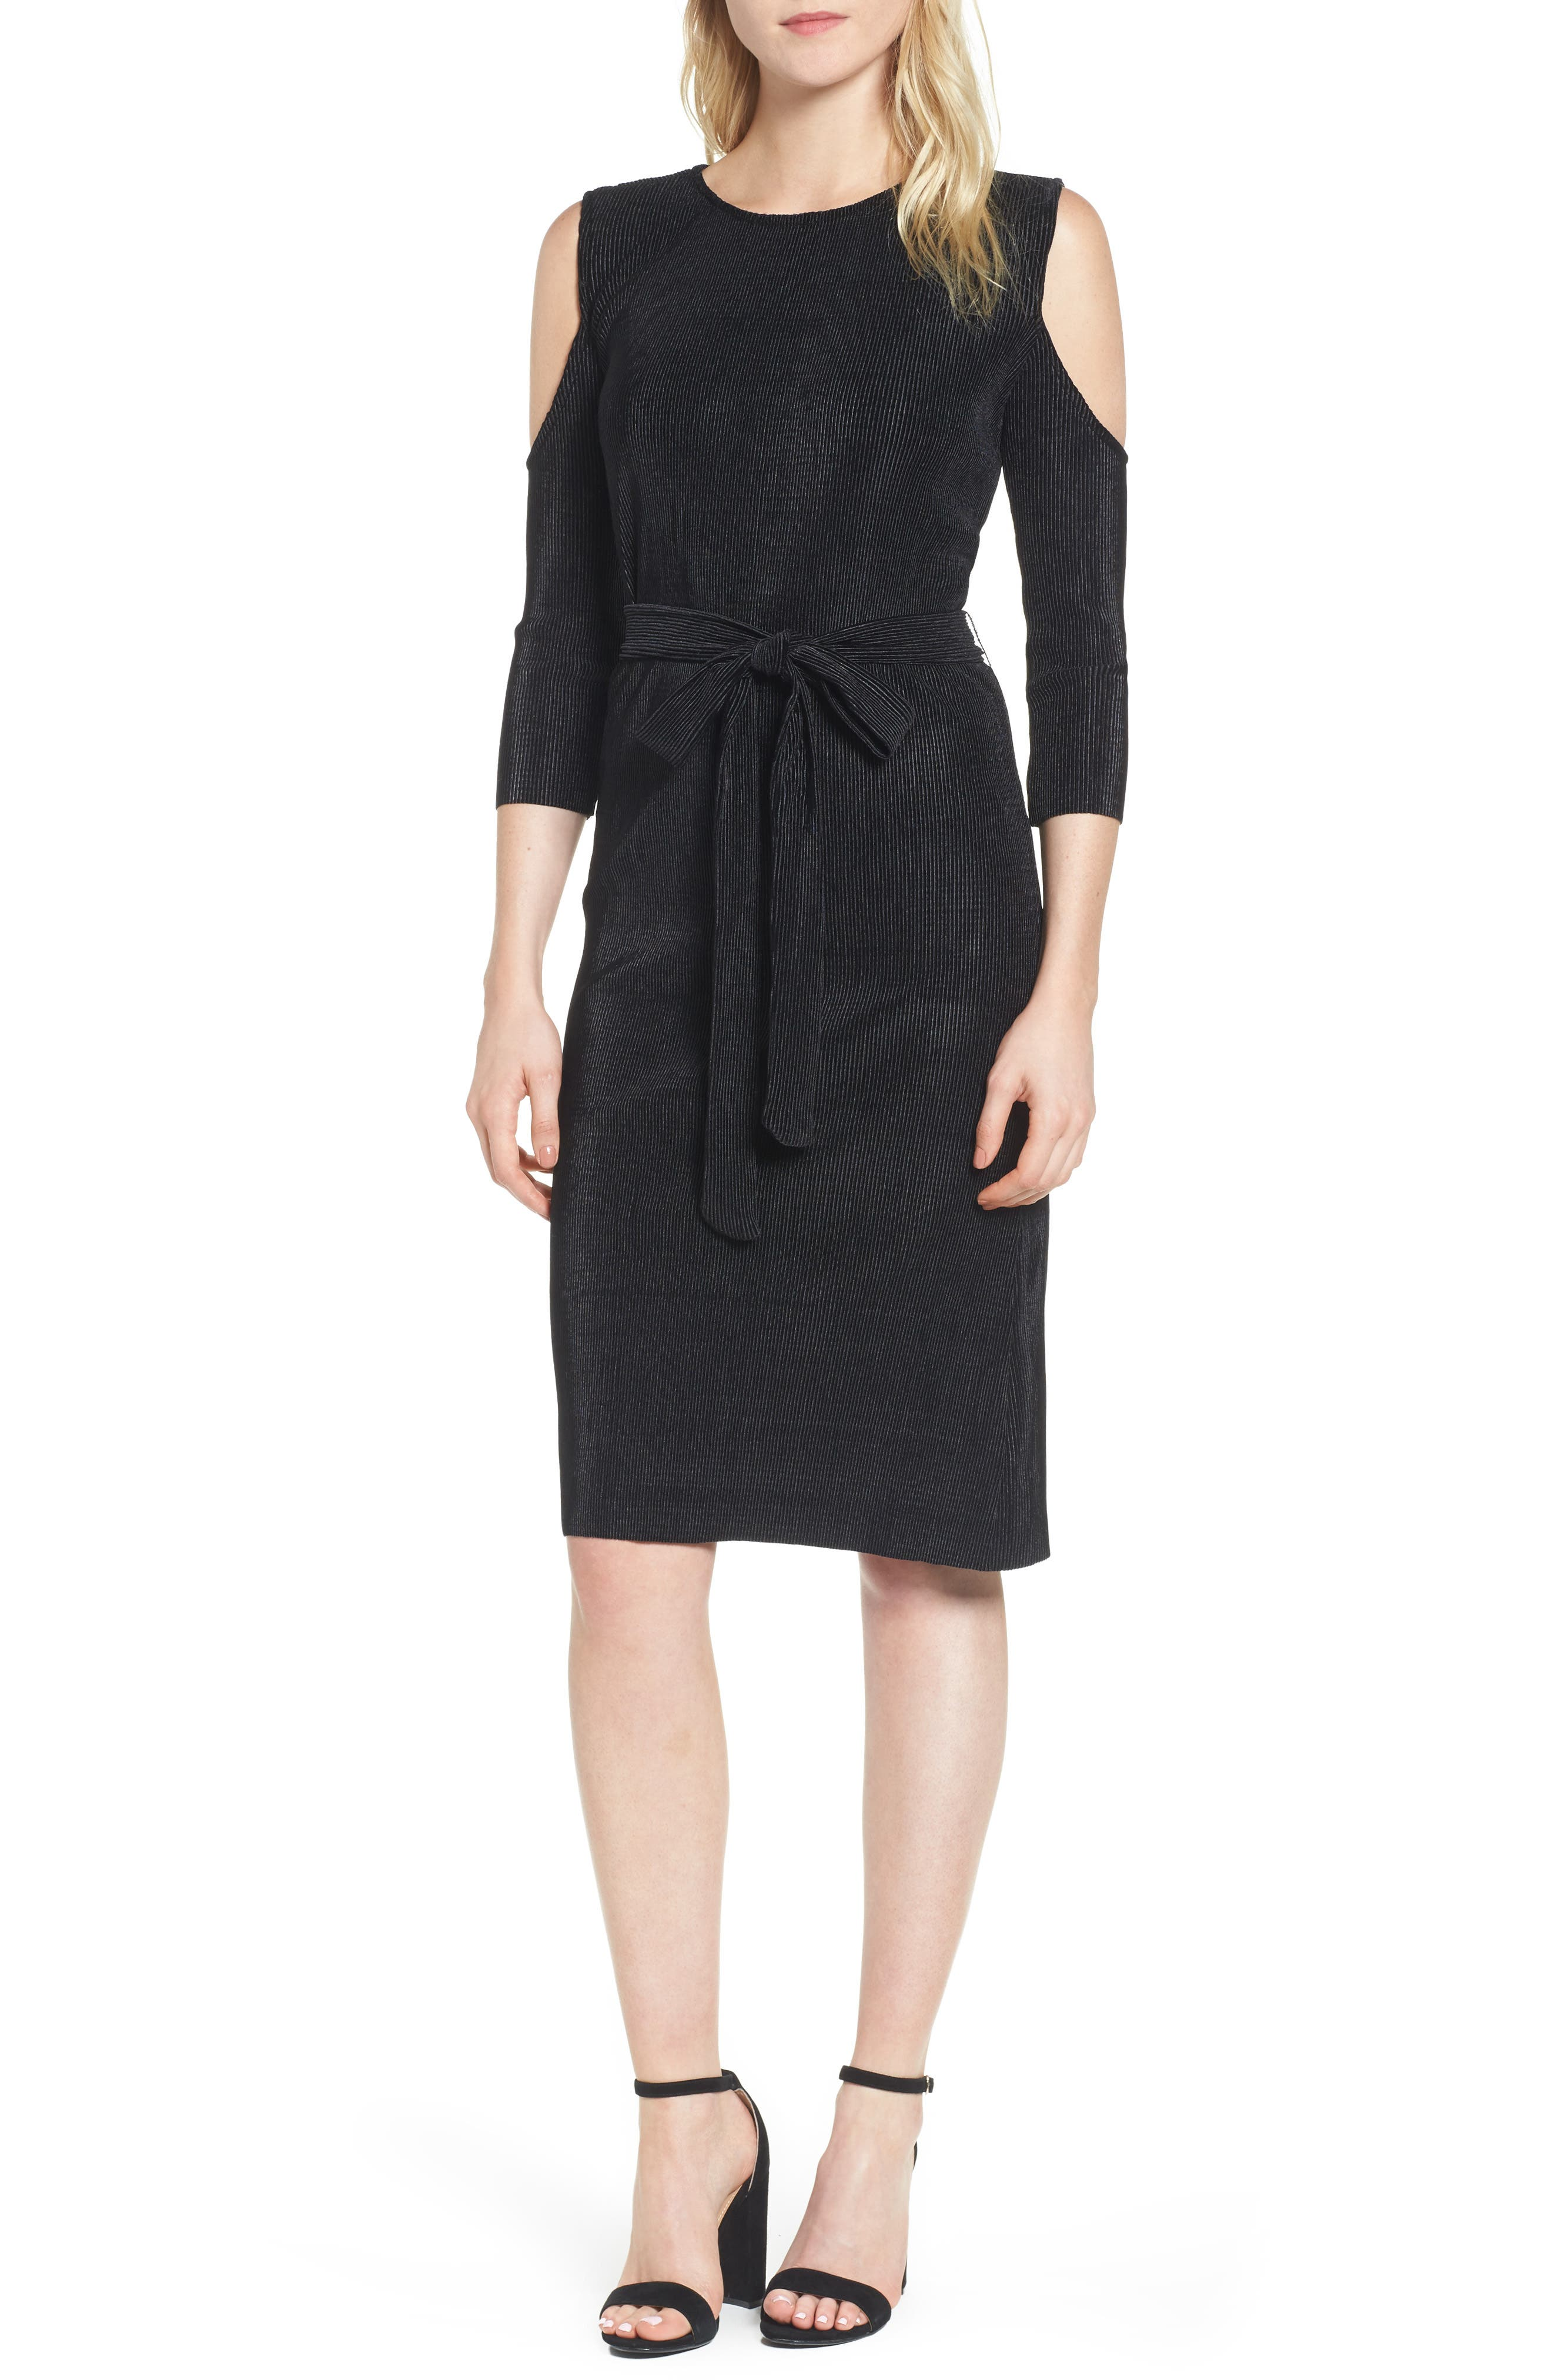 Bishop + Young Sasha Cold Shoulder Dress,                         Main,                         color,